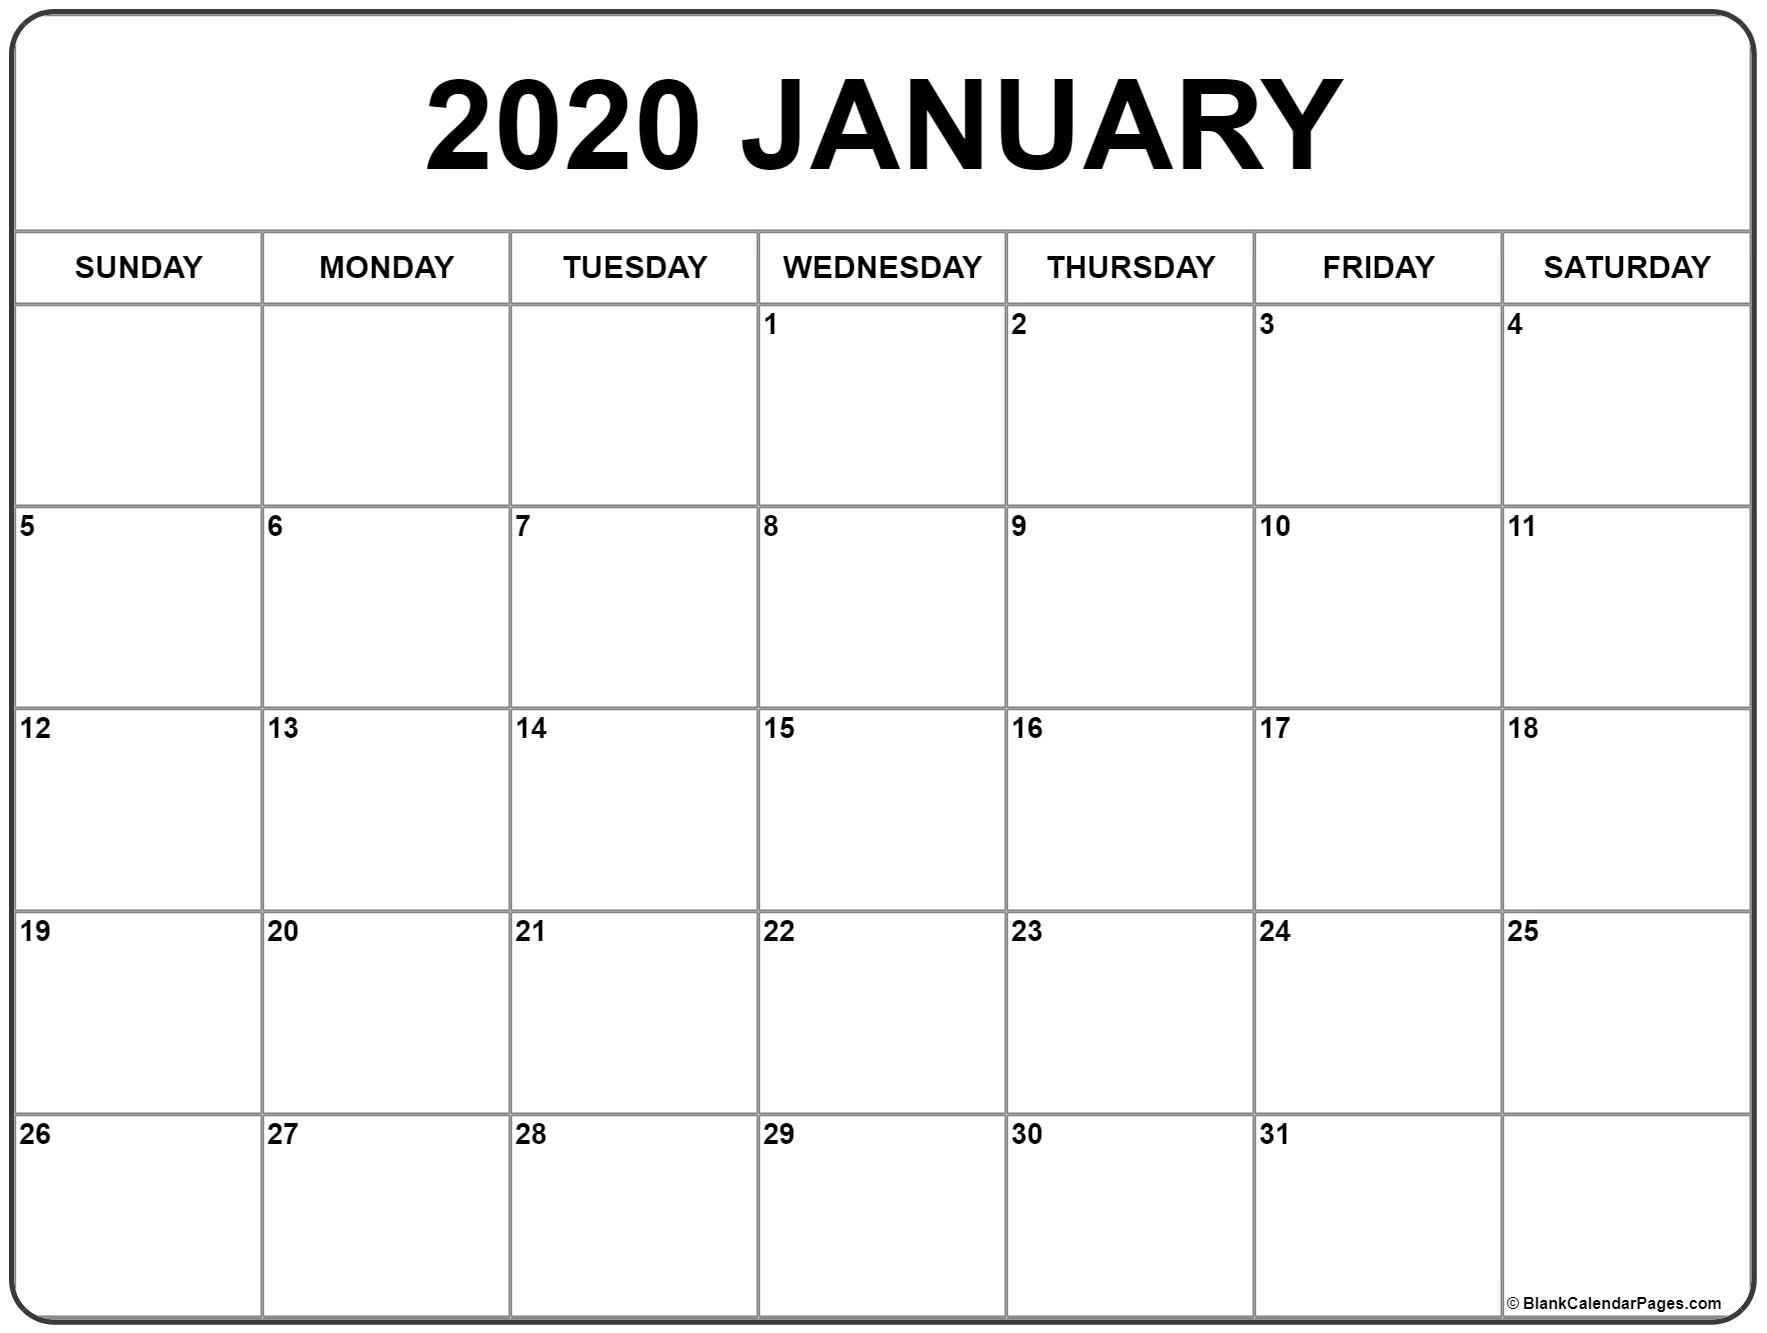 Take 2020 Free Printable Calendars Without Downloading